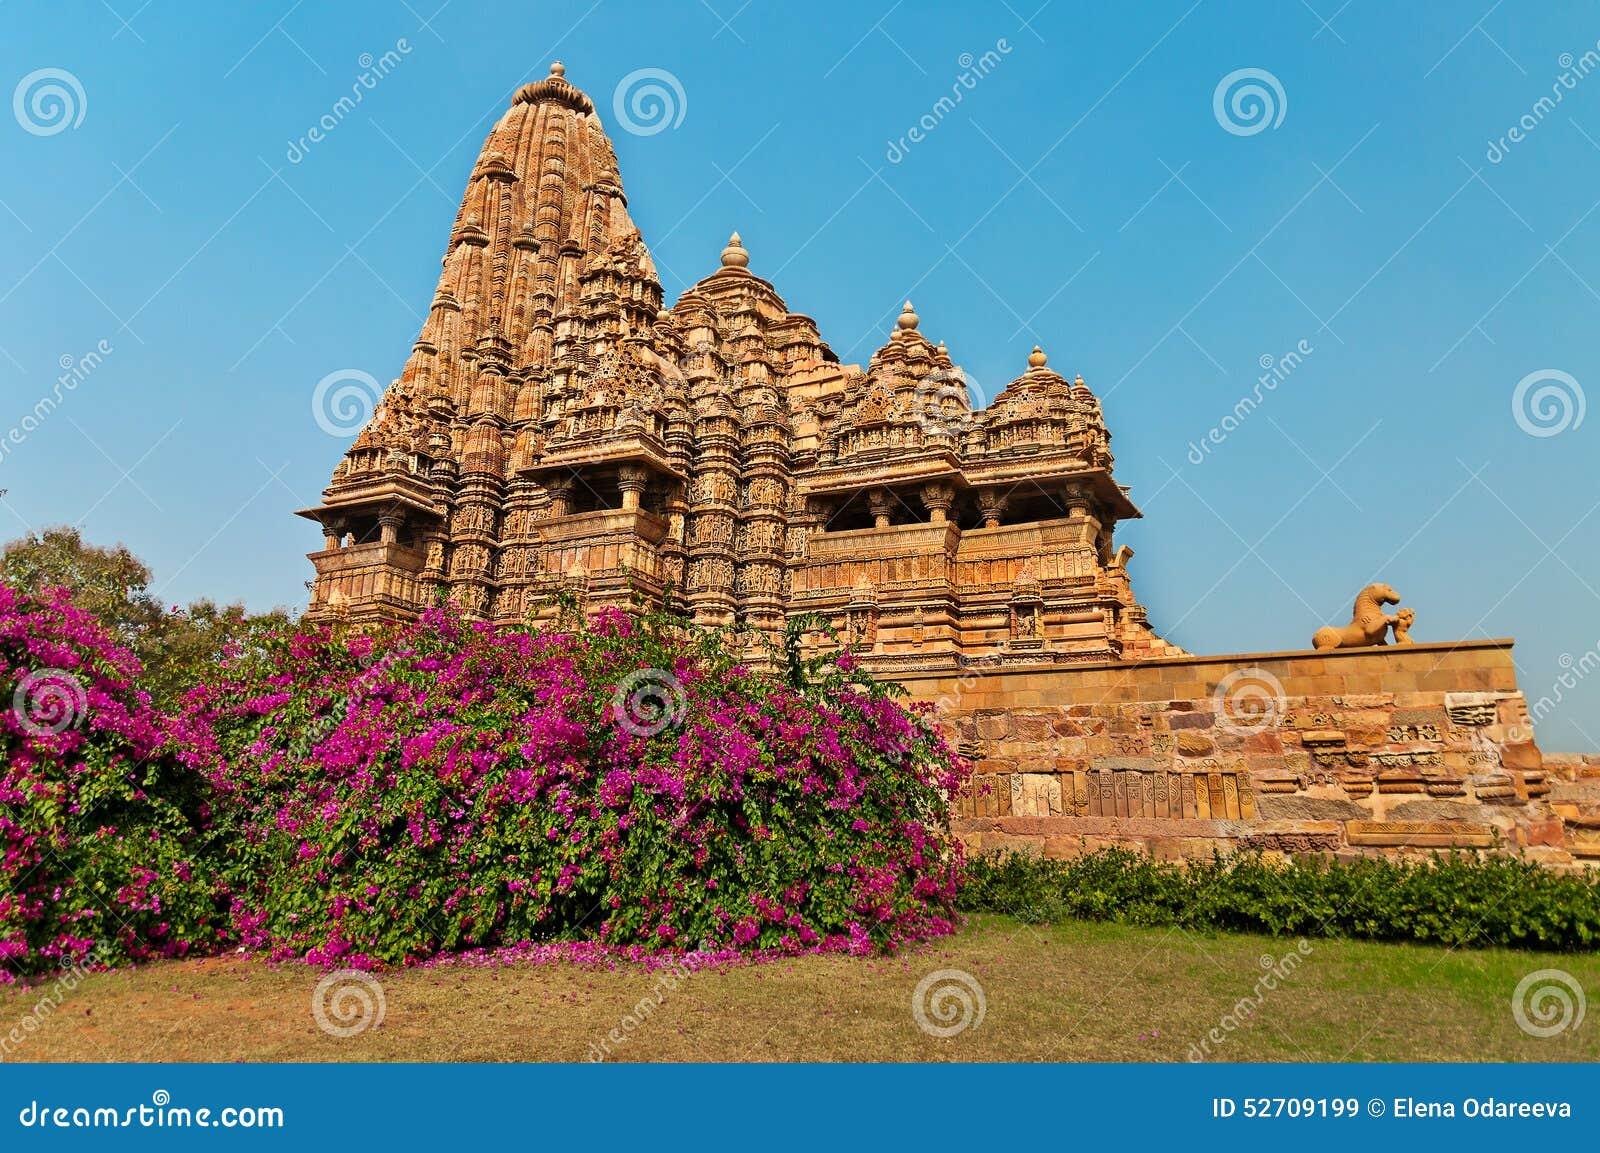 Famous kandariya mahadeva temple in khajuraho india